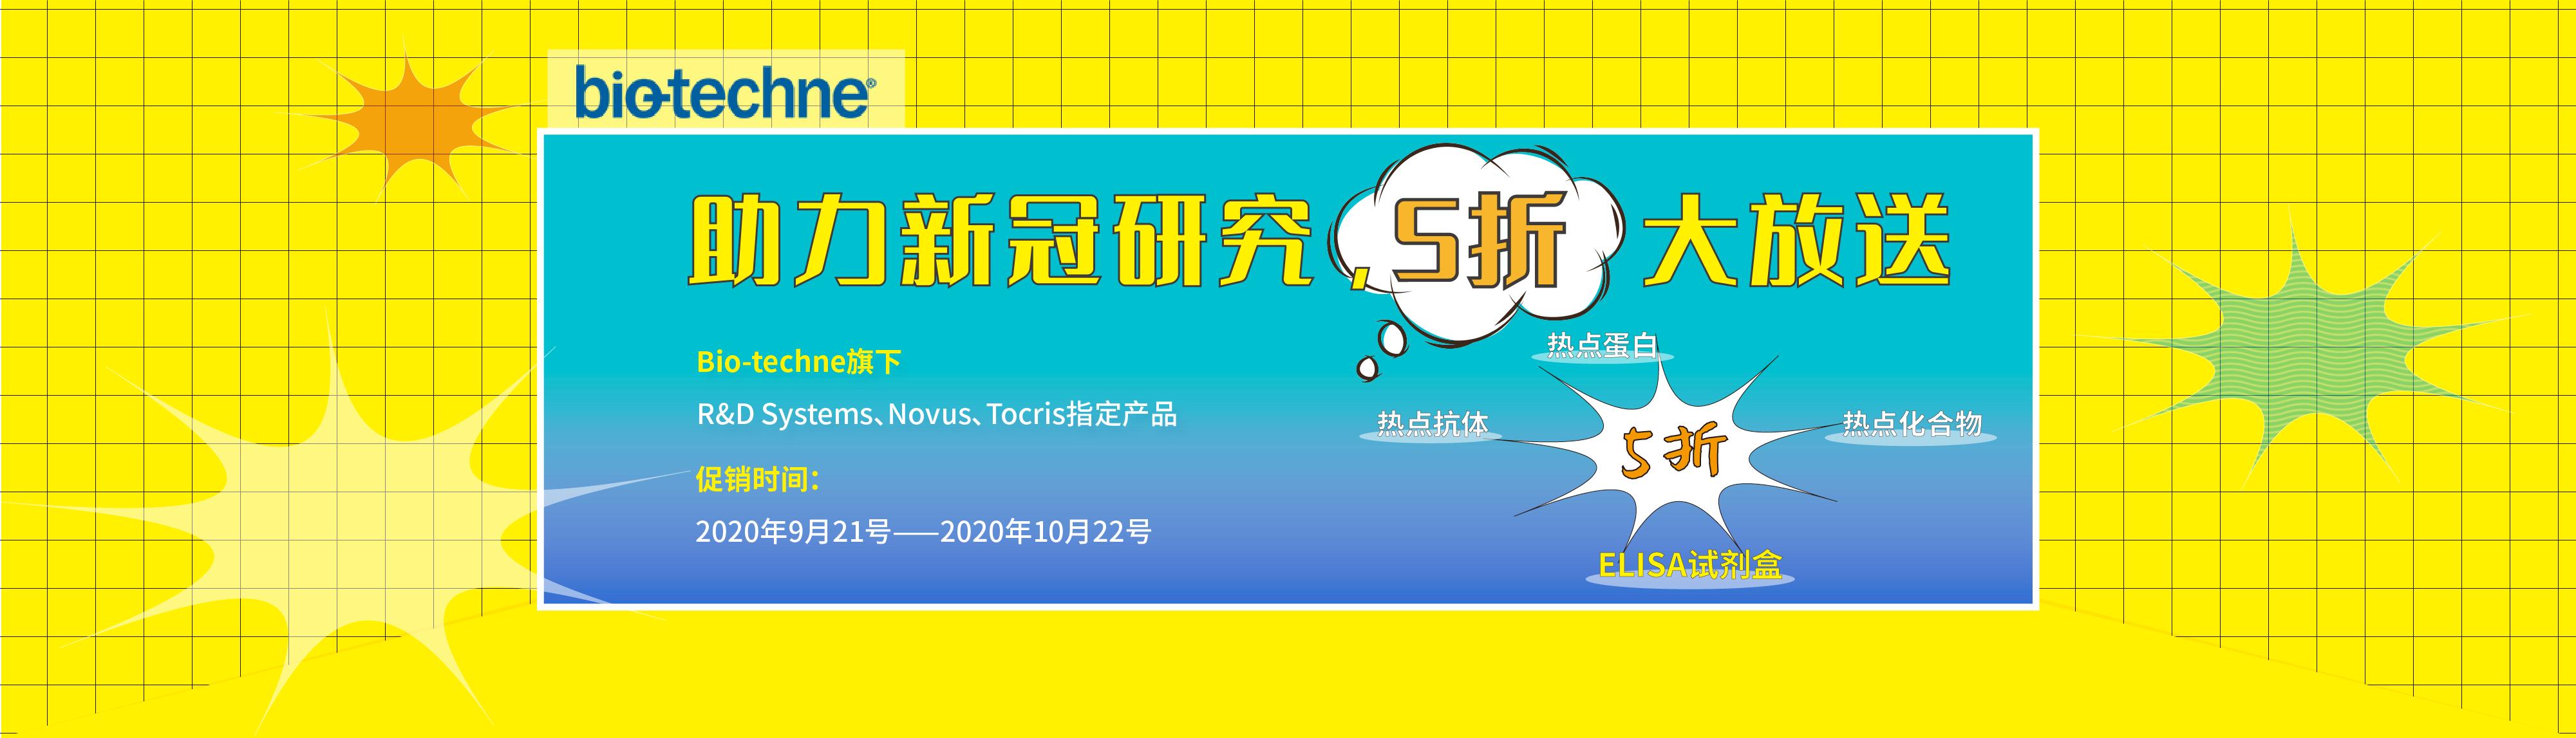 Bio-techne五折促销活动banner-01